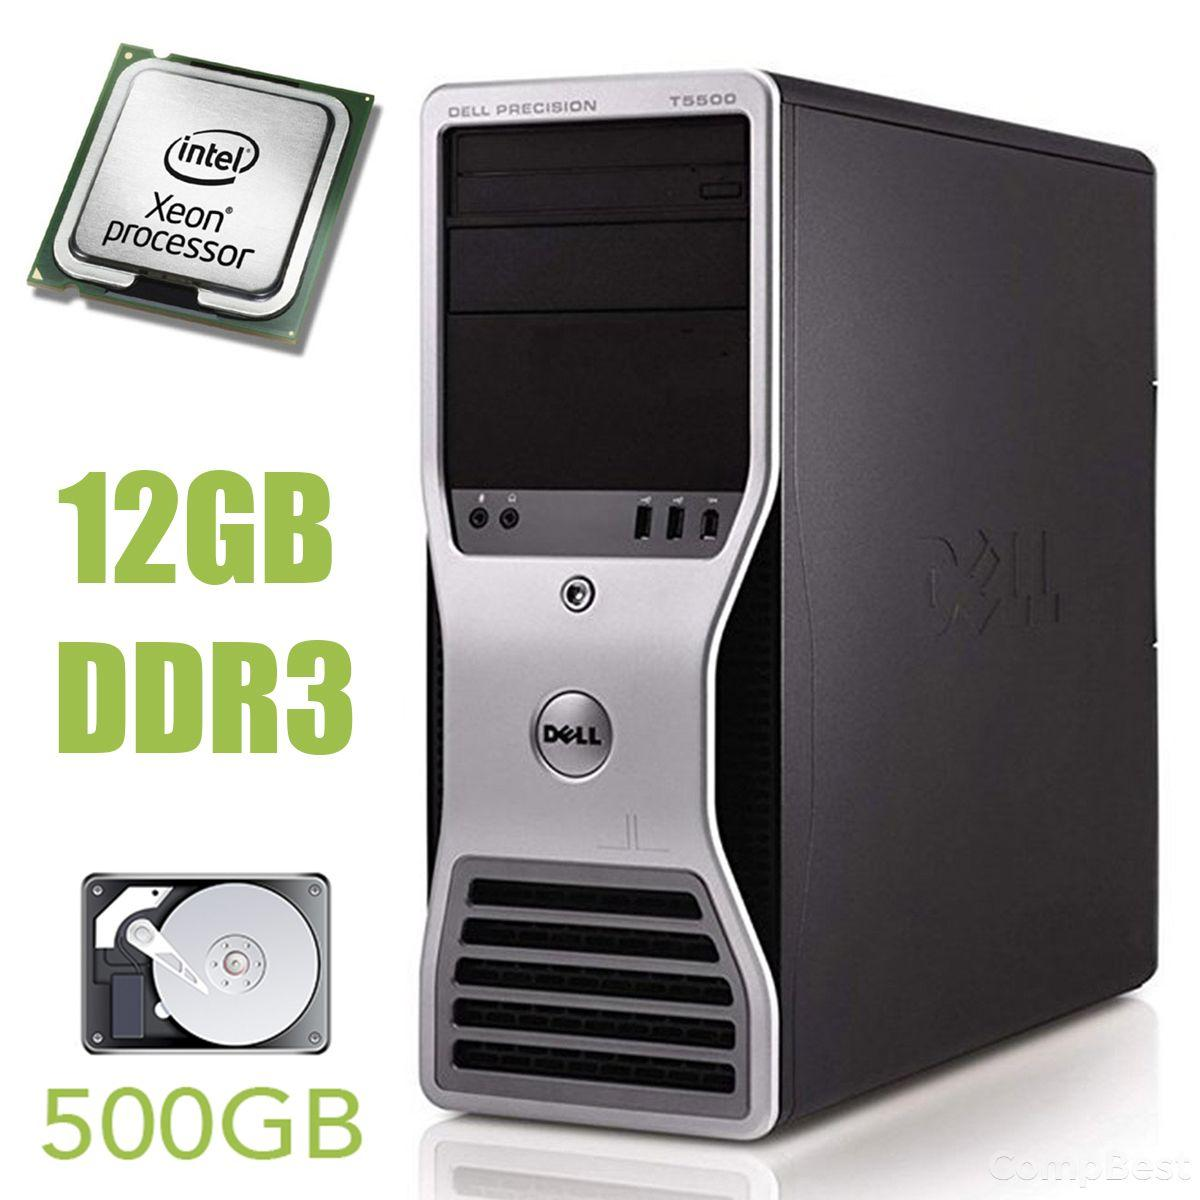 Dell Precision T5500 MT / Intel Xeon E5607 (4 ядра по 2.26 GHz) / 12 GB DDR3 / 500 GB HDD